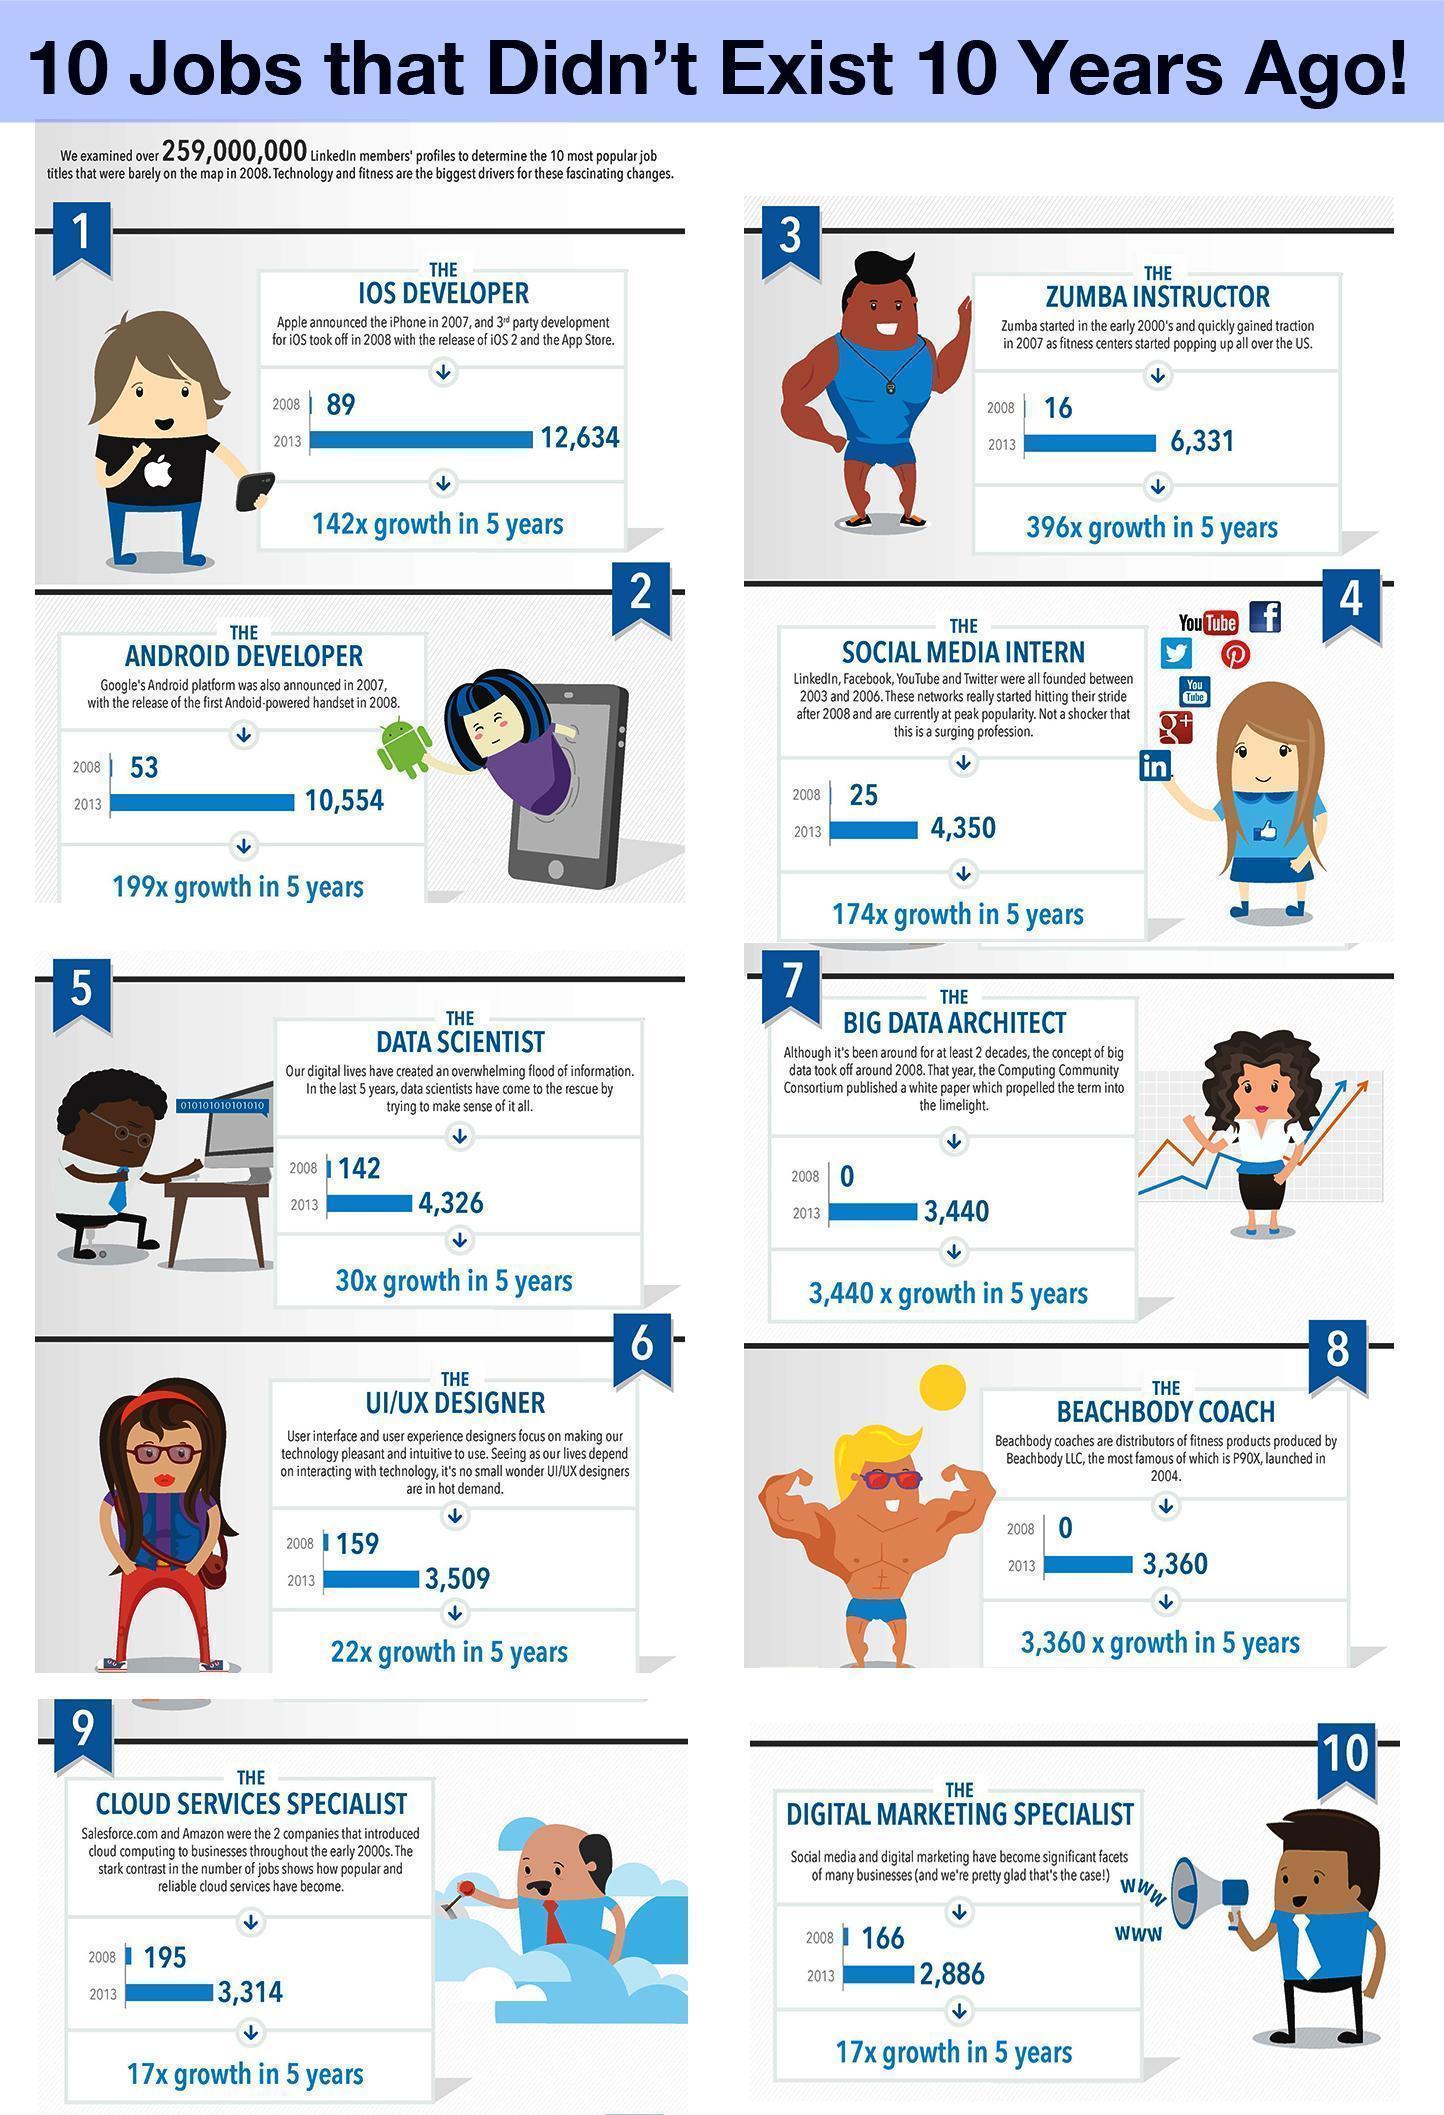 10-jobs-socialmedia-spezialist-tom-treber